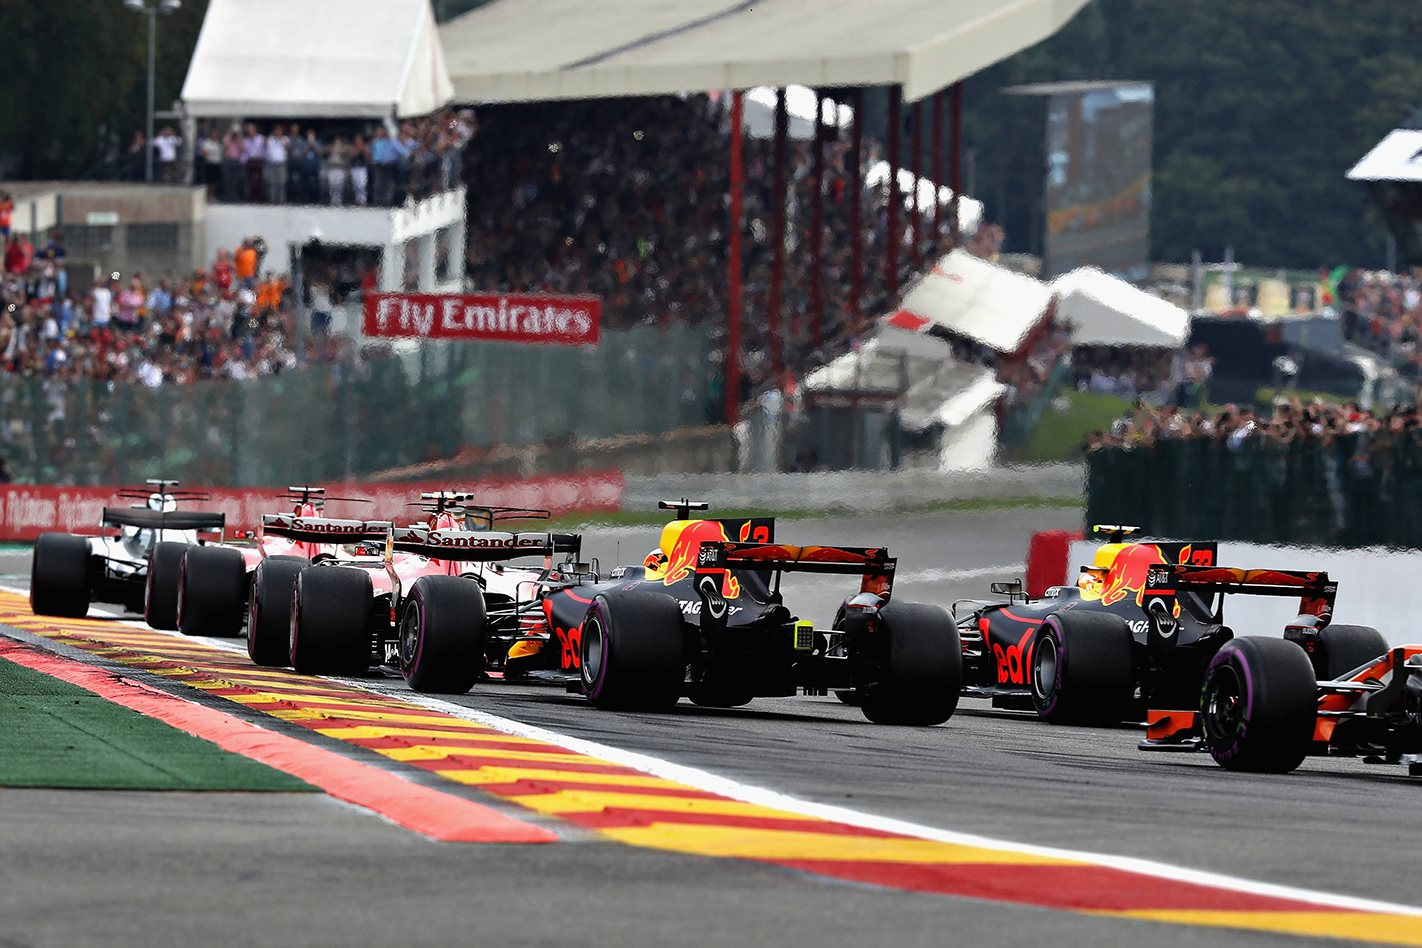 Lewis Hamilton wins 2017 Belgian Grand Prix